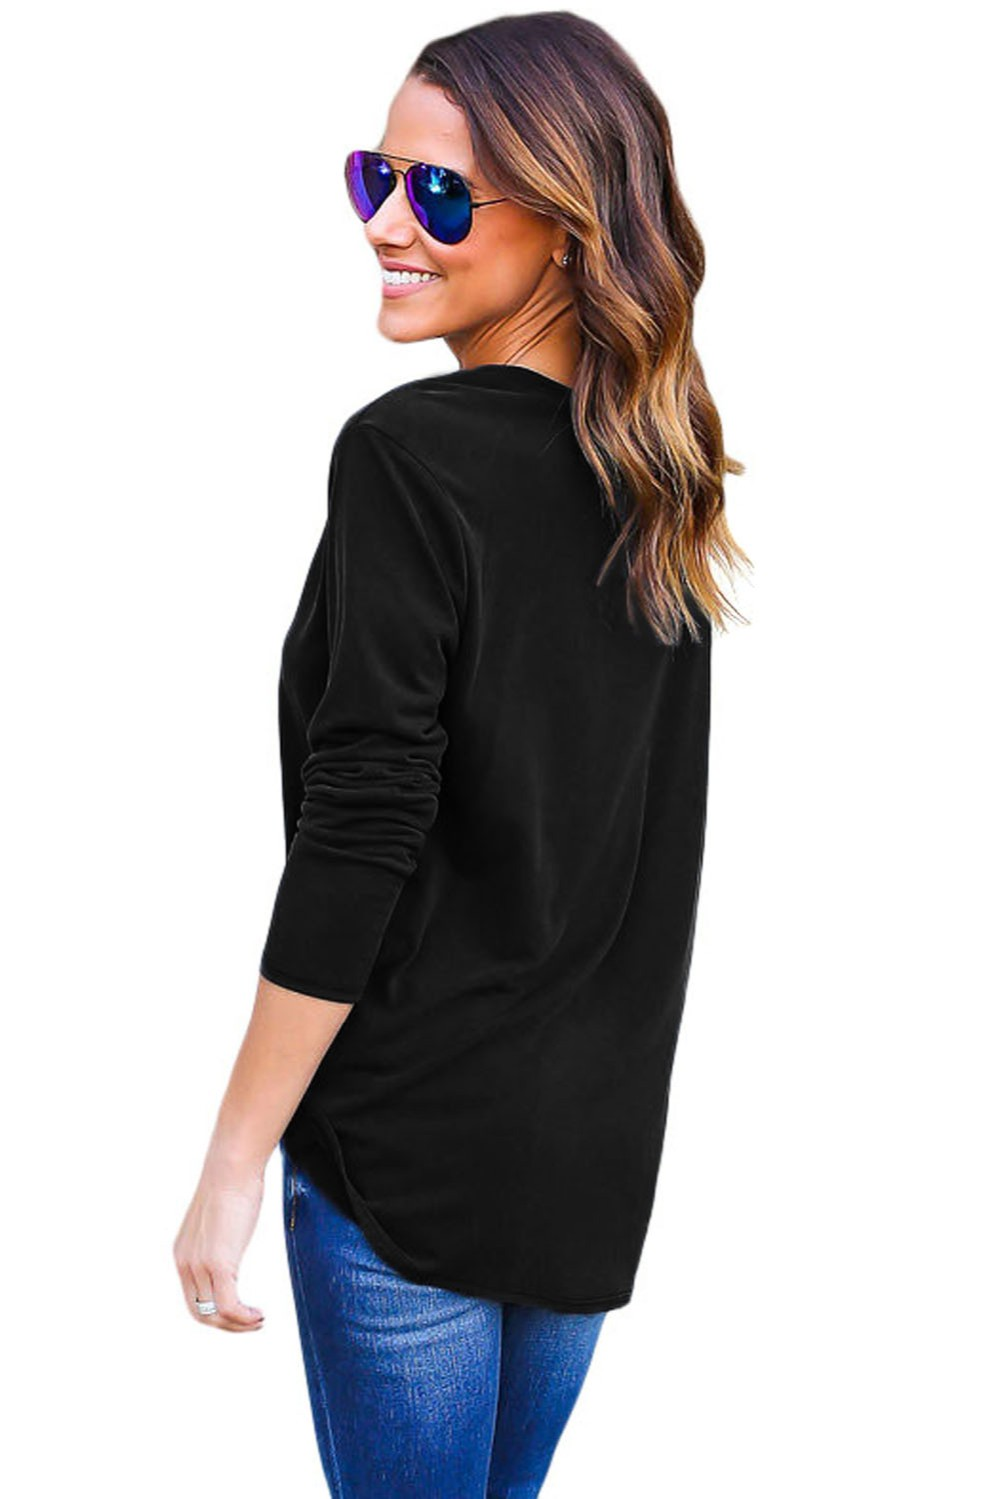 Black-Long-Sleeves-Drape-Top-LC25995-2-2